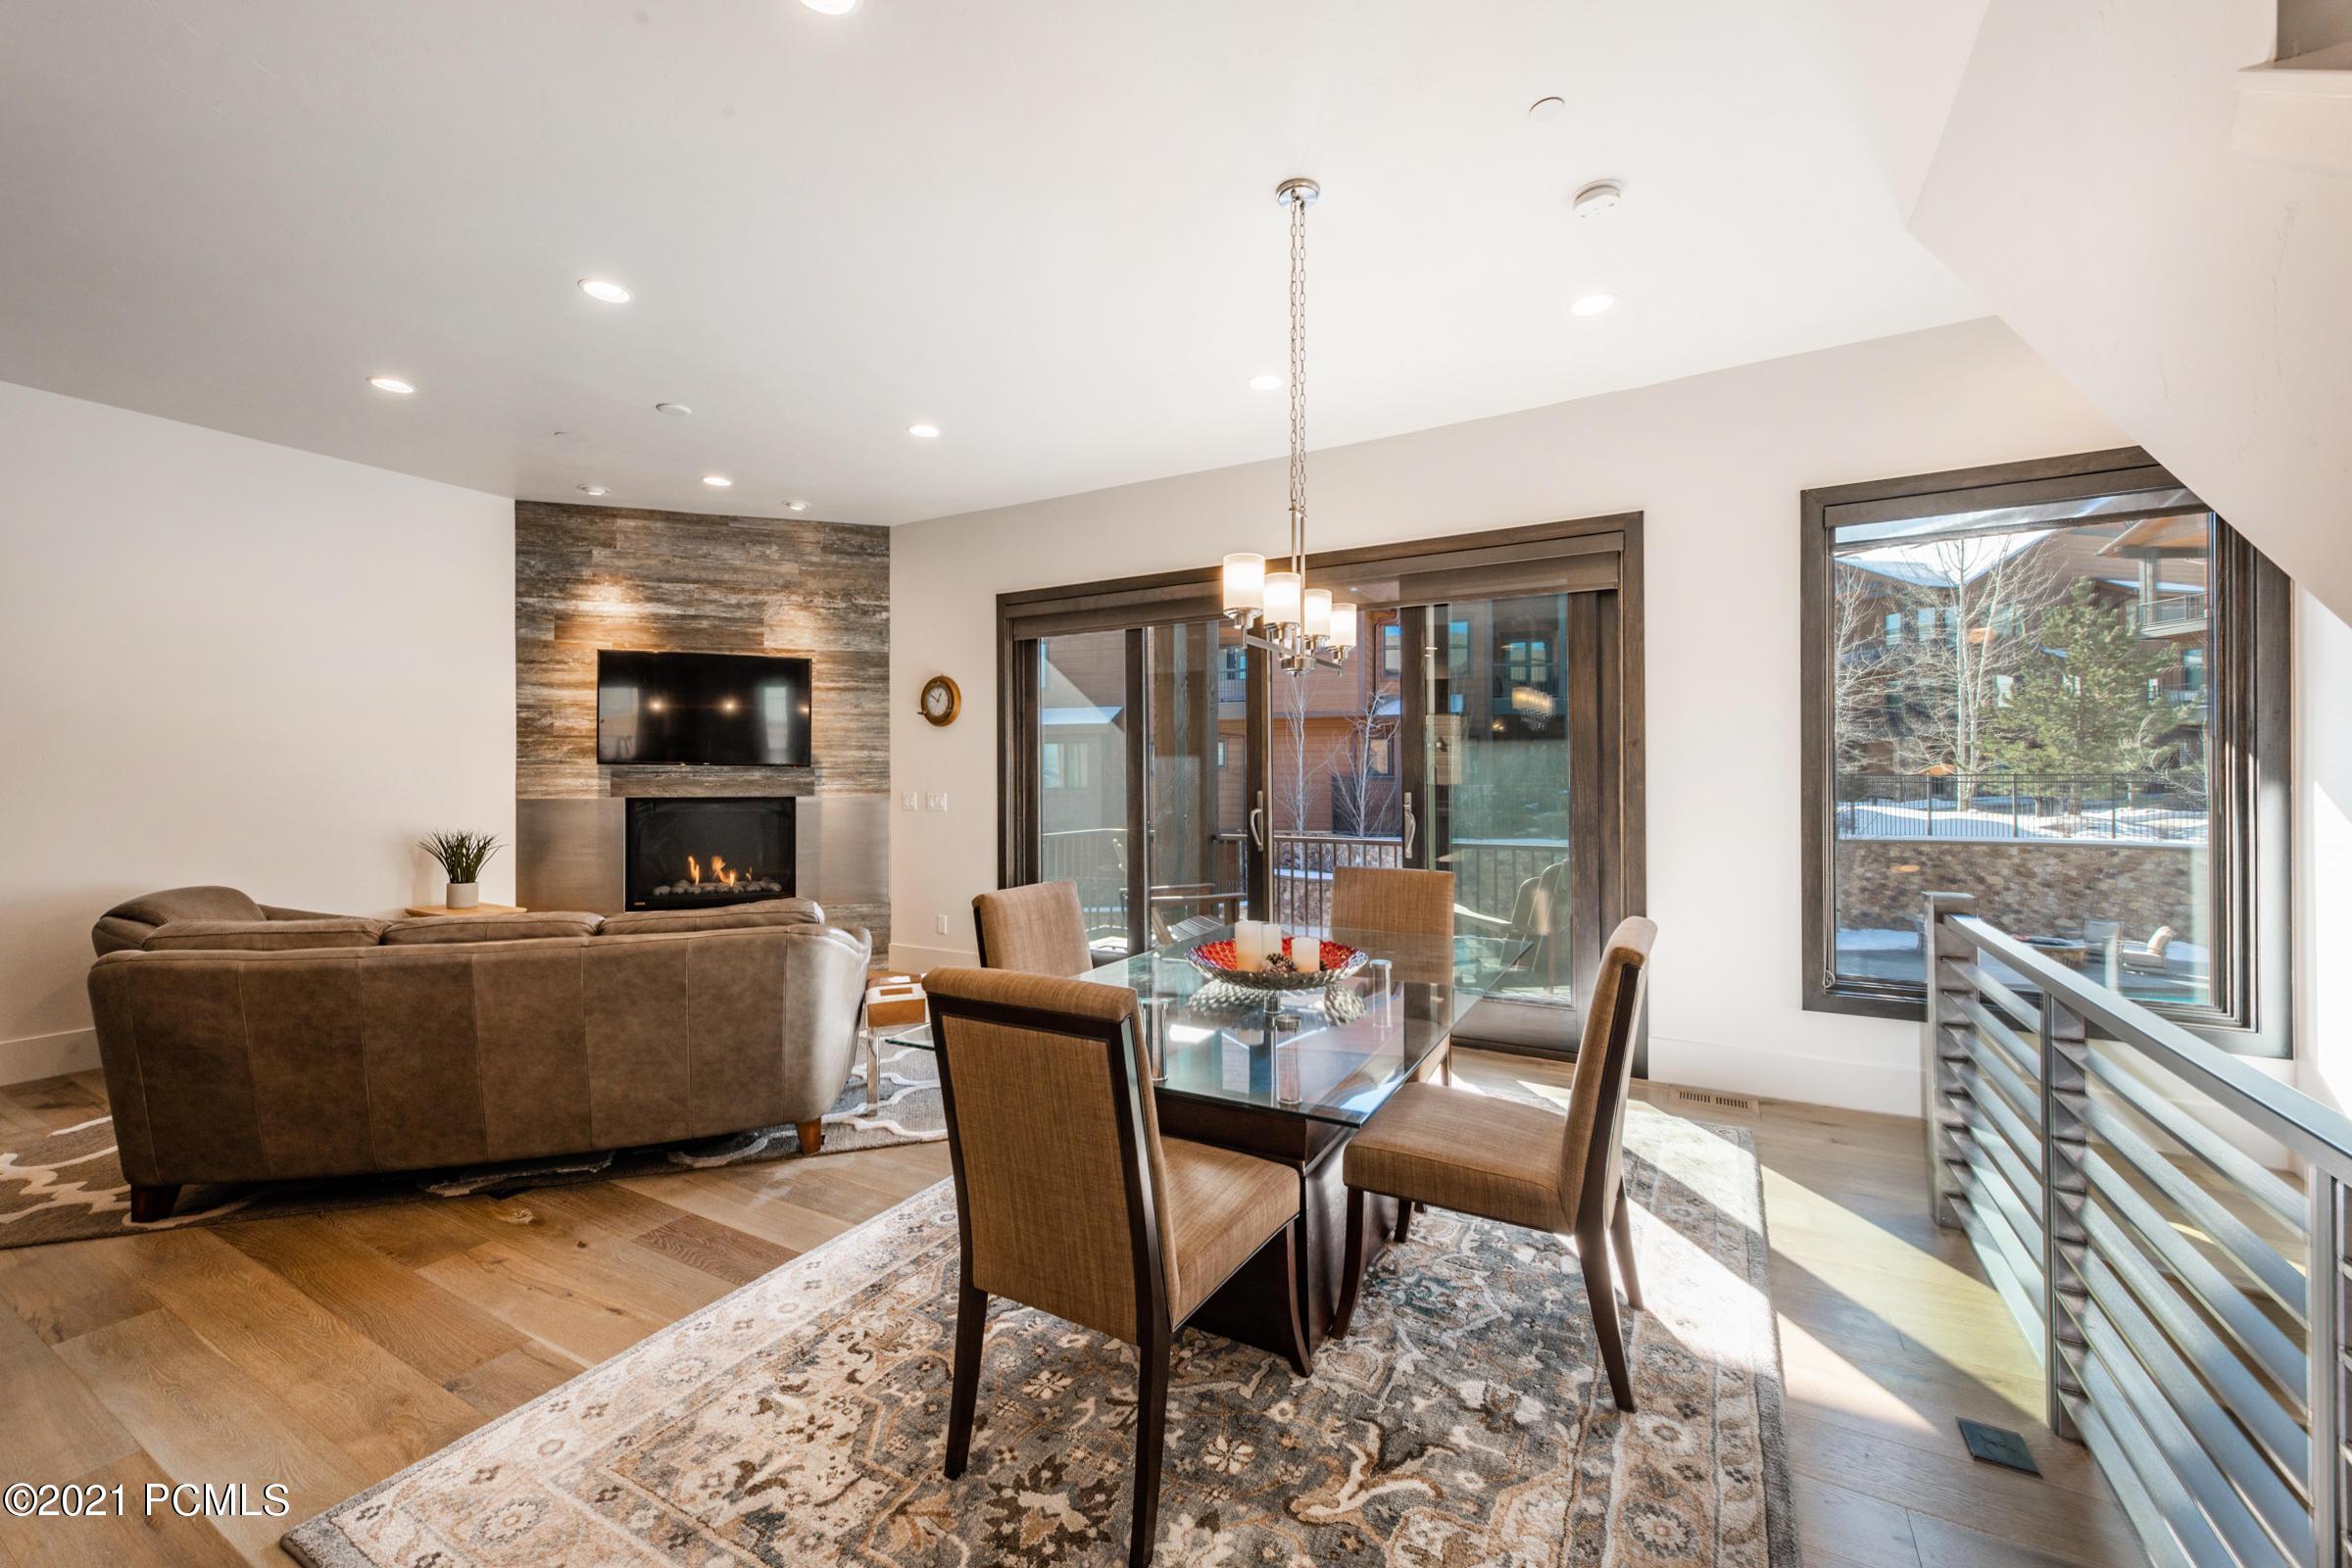 4264 Willow Draw Road, Park City, Utah 84098, 2 Bedrooms Bedrooms, ,3 BathroomsBathrooms,Condominium,For Sale,Willow Draw,12100076